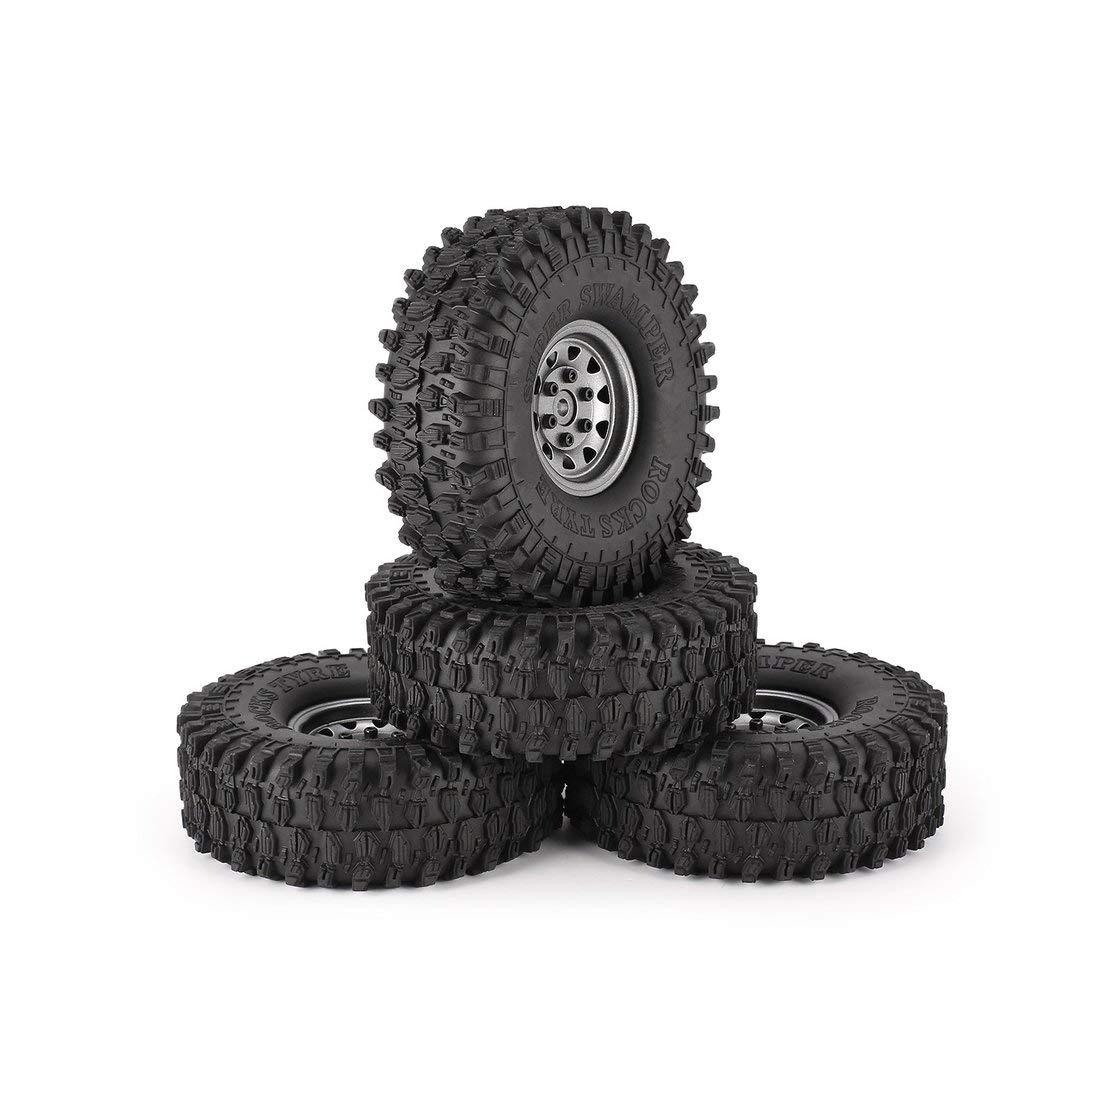 Formulaone 4Pcs 1.9 Pulgadas Llantas de Goma de 120 mm Neumático con Borde de Rueda de Metal para 1/10 Traxxas TRX-4 SCX10 RC4 D90 RC Parte de Oruga